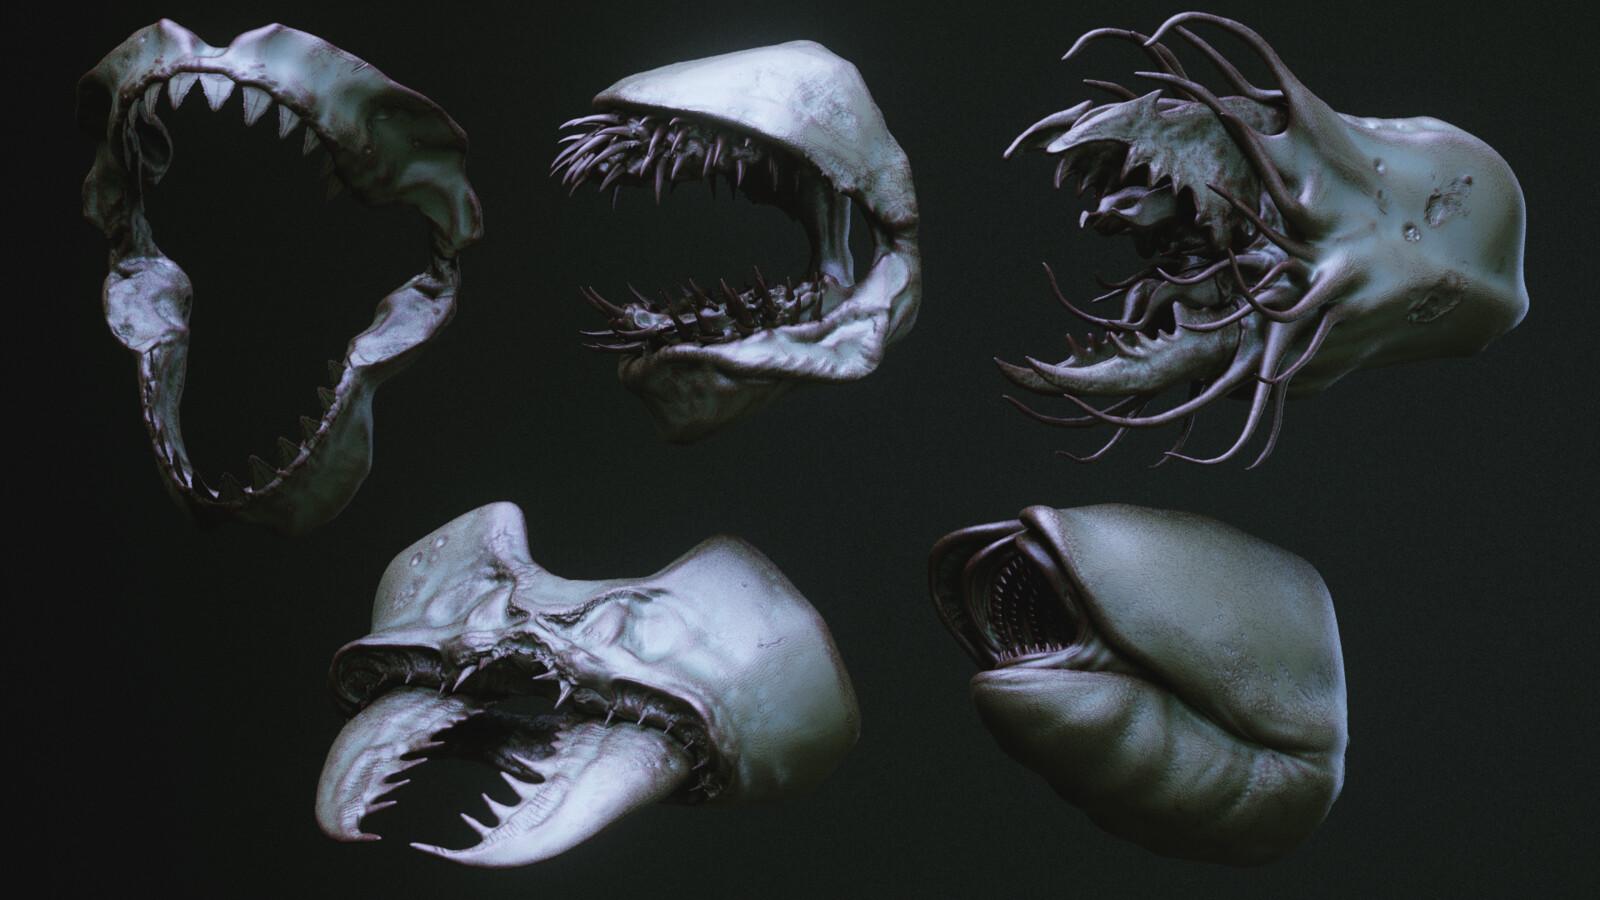 Jaws ■ Ripmaw ■ Camarach ■ Antoid ■ Worm (Bonus version)